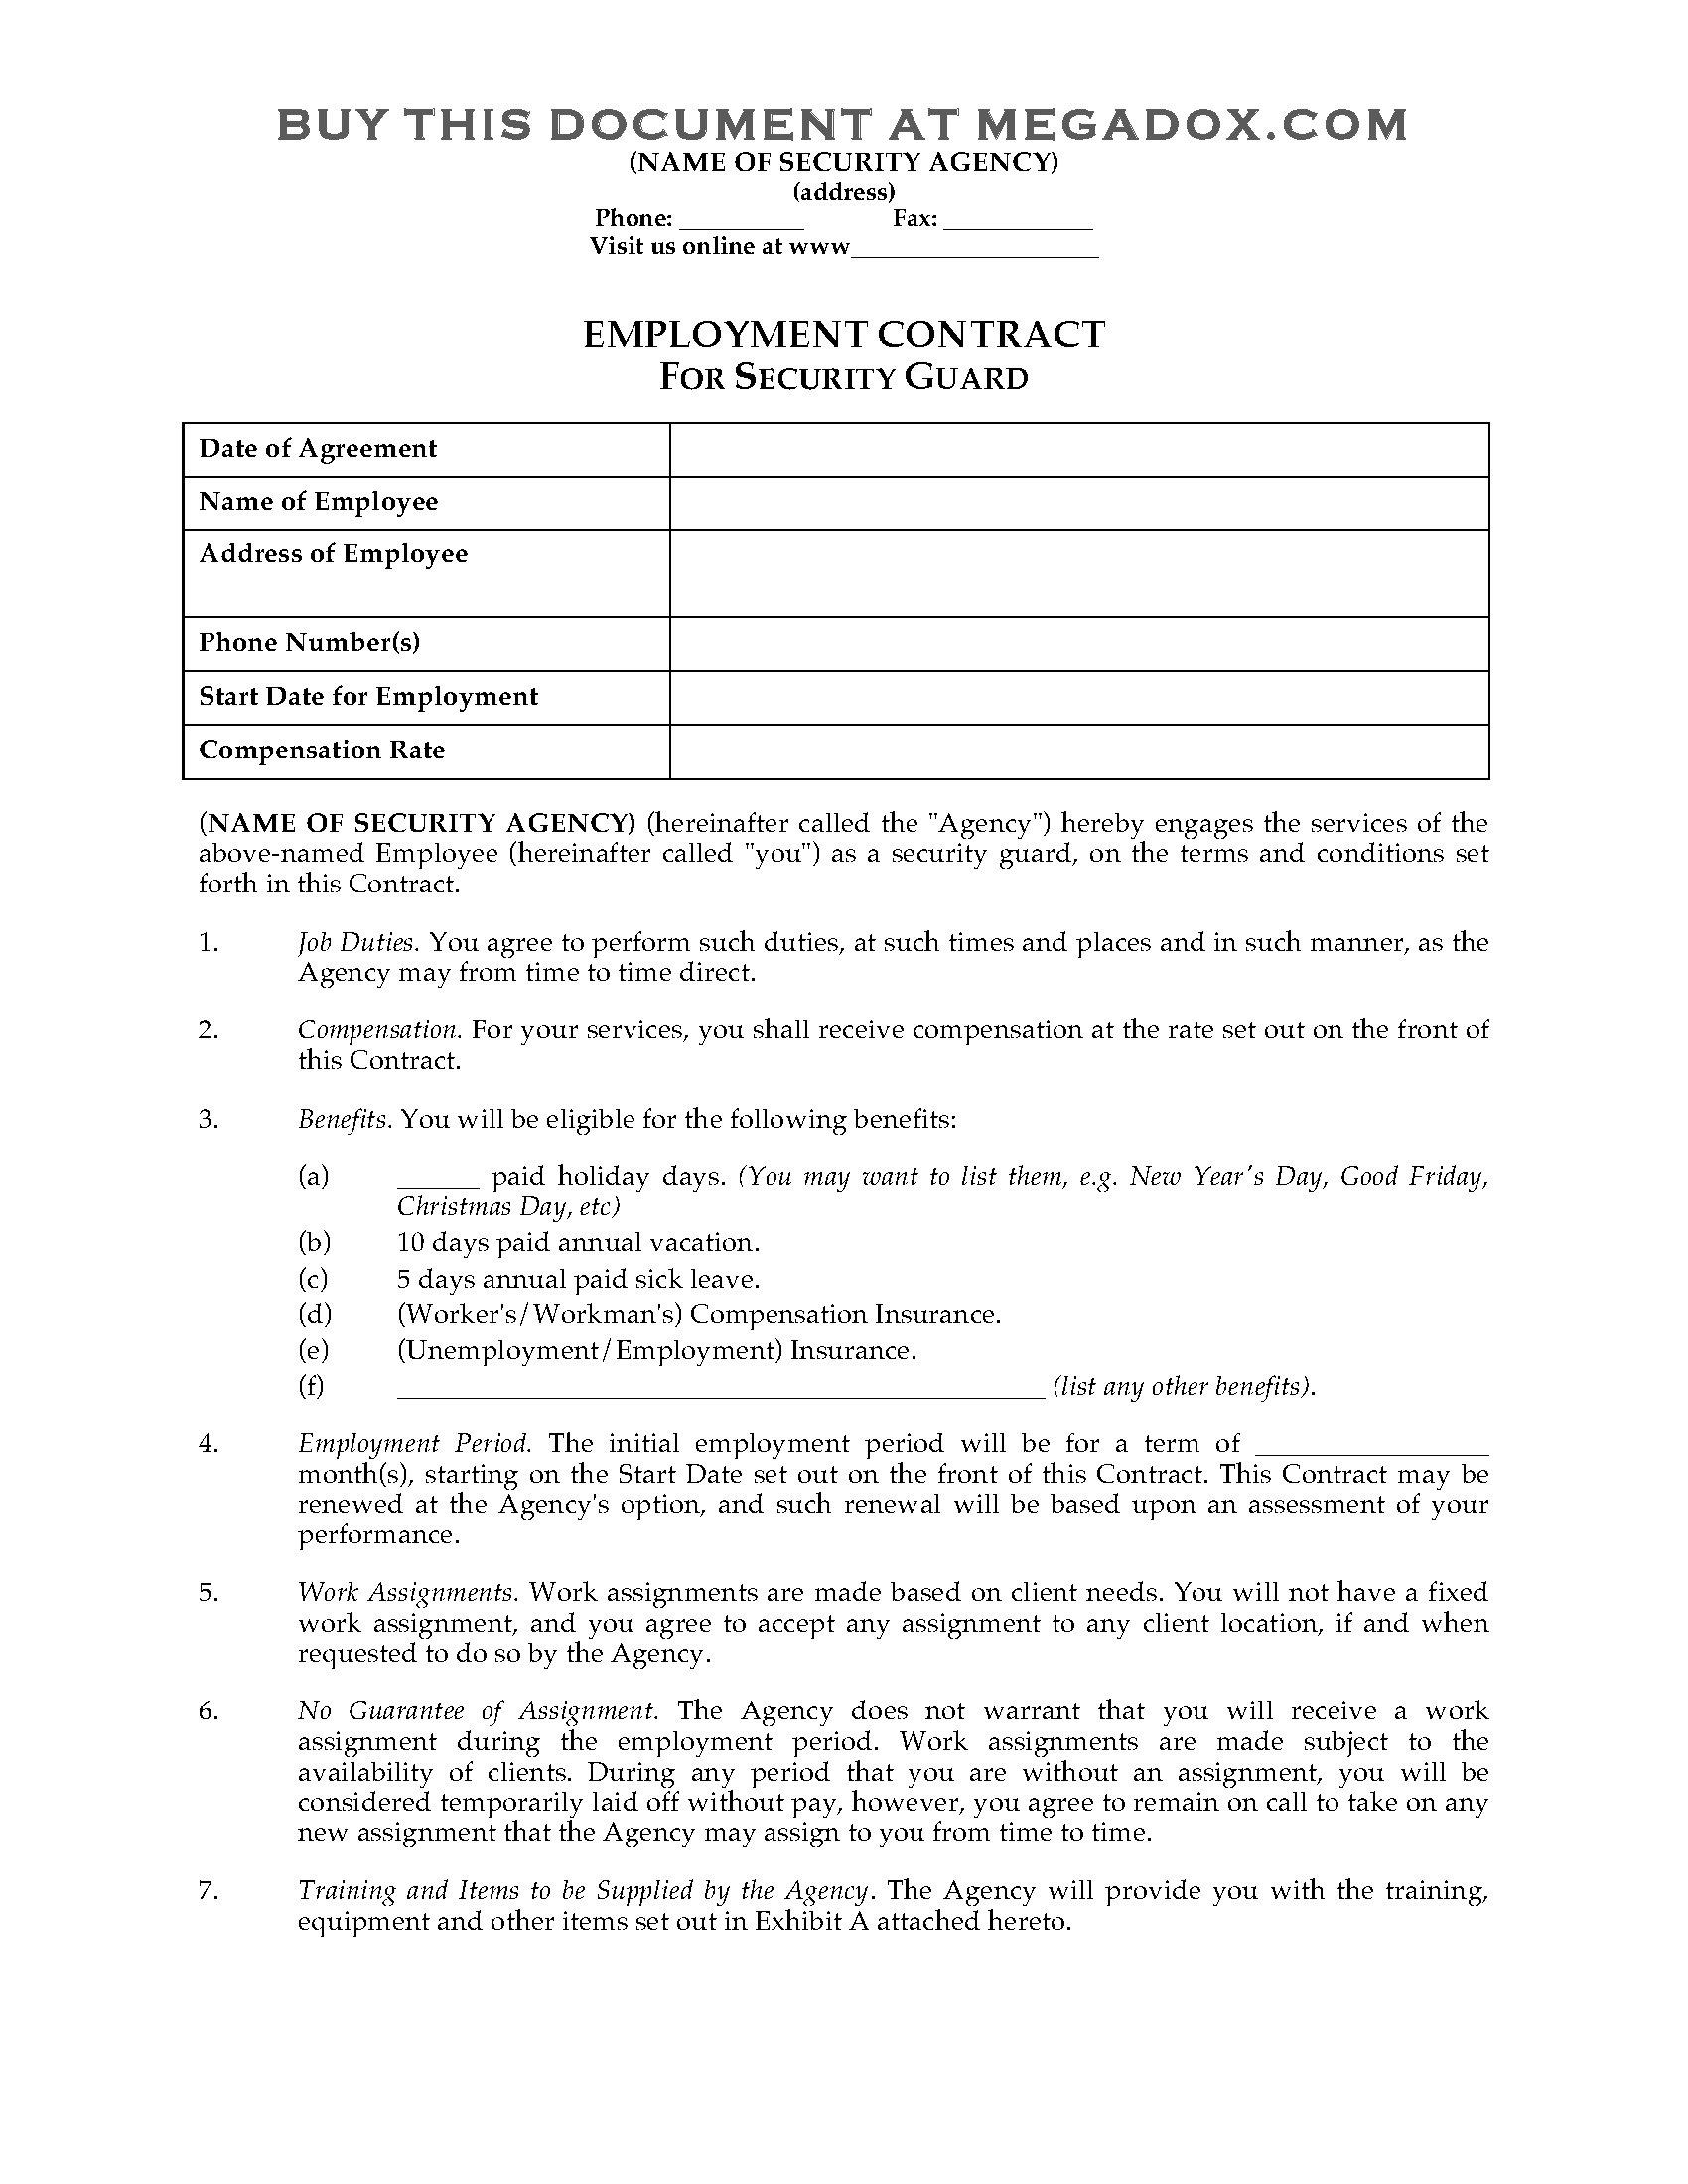 Employee Contract Template Alberta